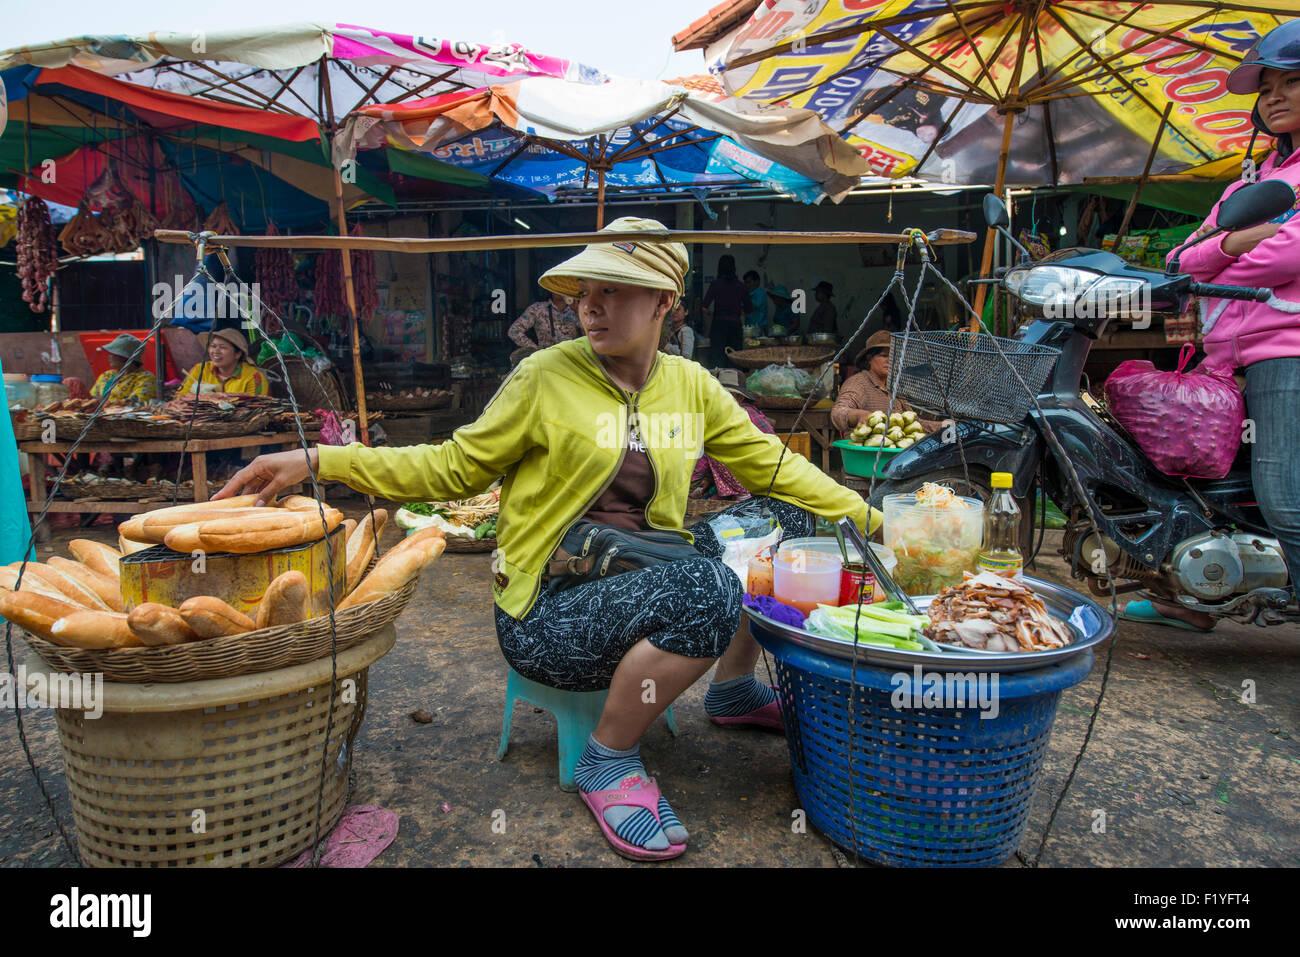 A street vendor selling the Vietnamese sandwich, banh mi in Siem Reap's Psar Leu Market. Local market. Siem - Stock Image